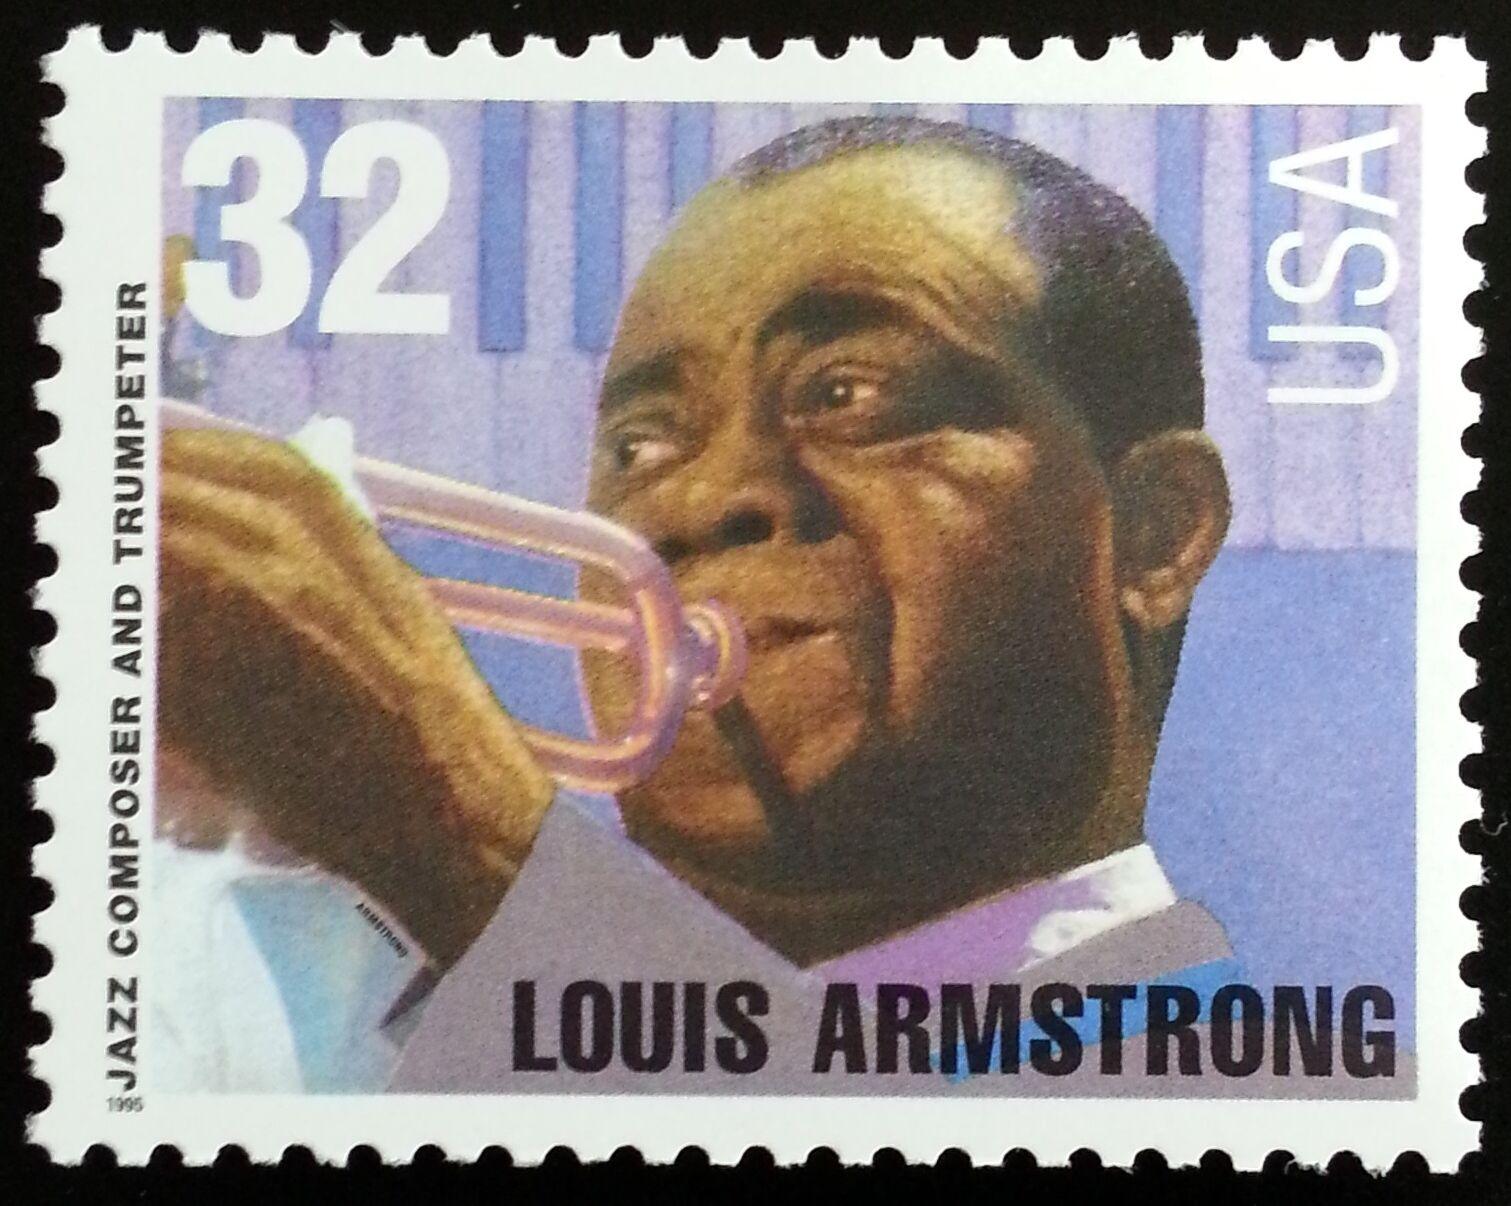 1995 32c Louis Armstrong, Jazz & Trumpet Scott 2982 Min